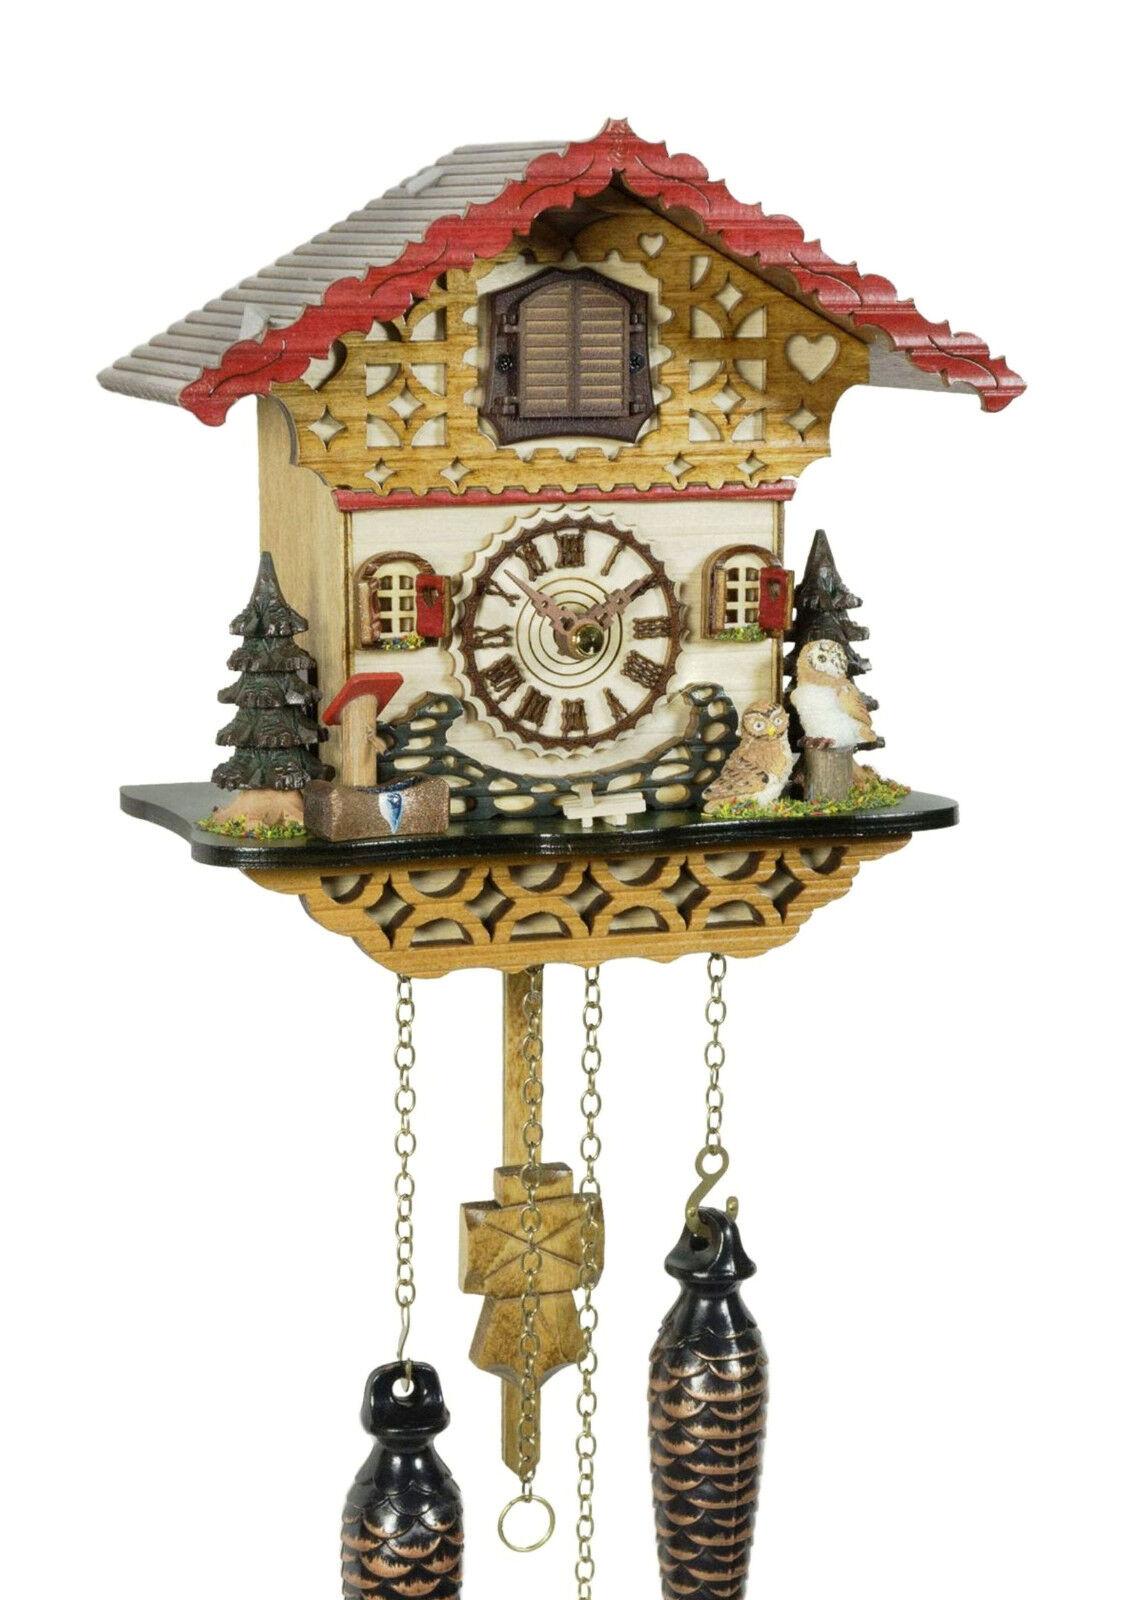 Cuckoo clock black forest quartz german music chalet style wood new owls new ebay - Wooden cuckoo clocks ...